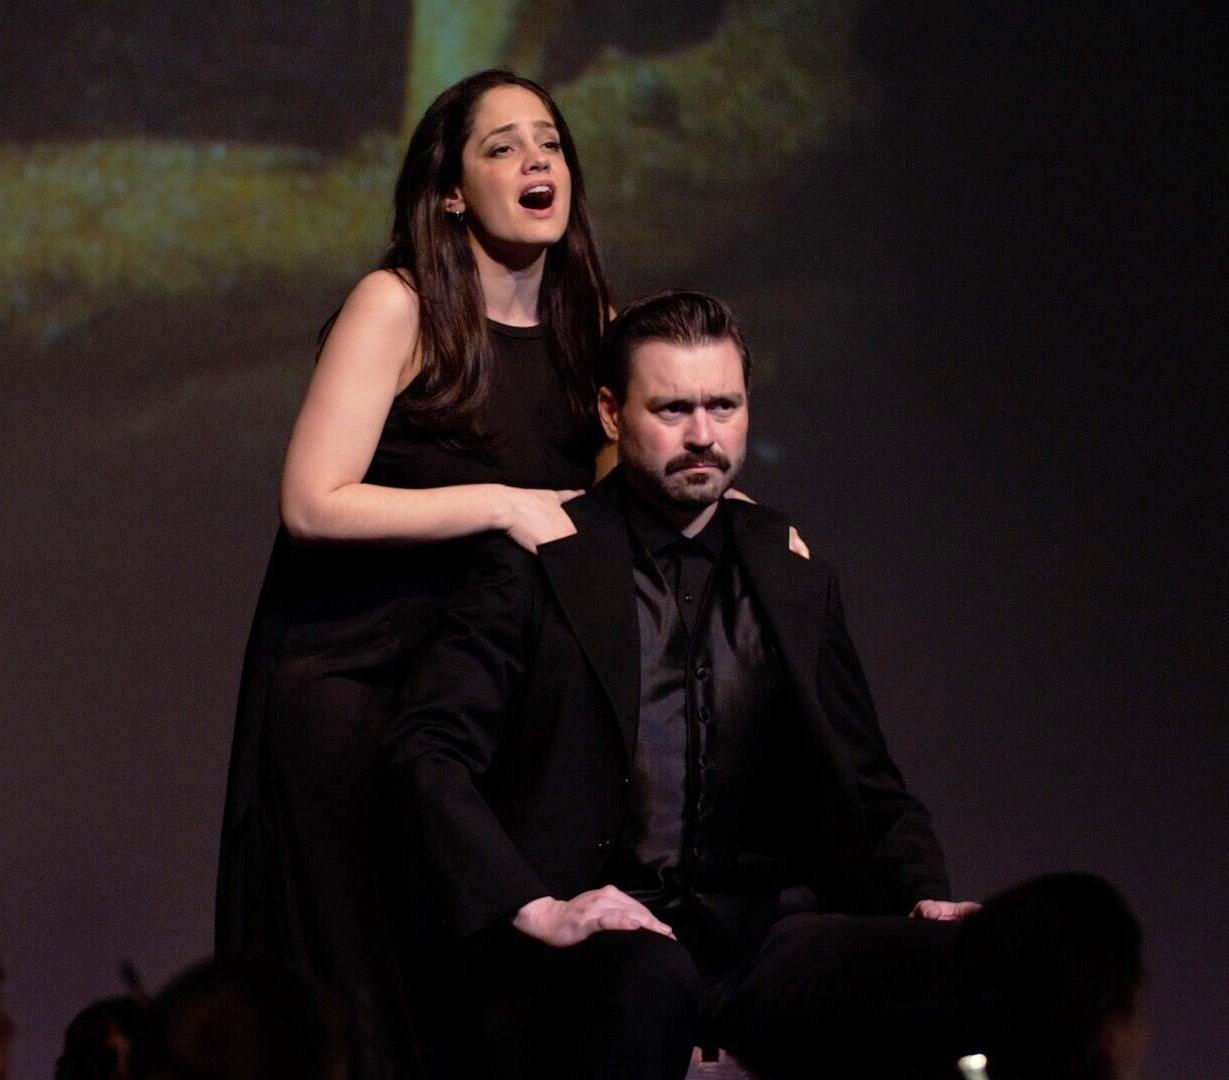 Proserpina in Monteverdi's Orfeo